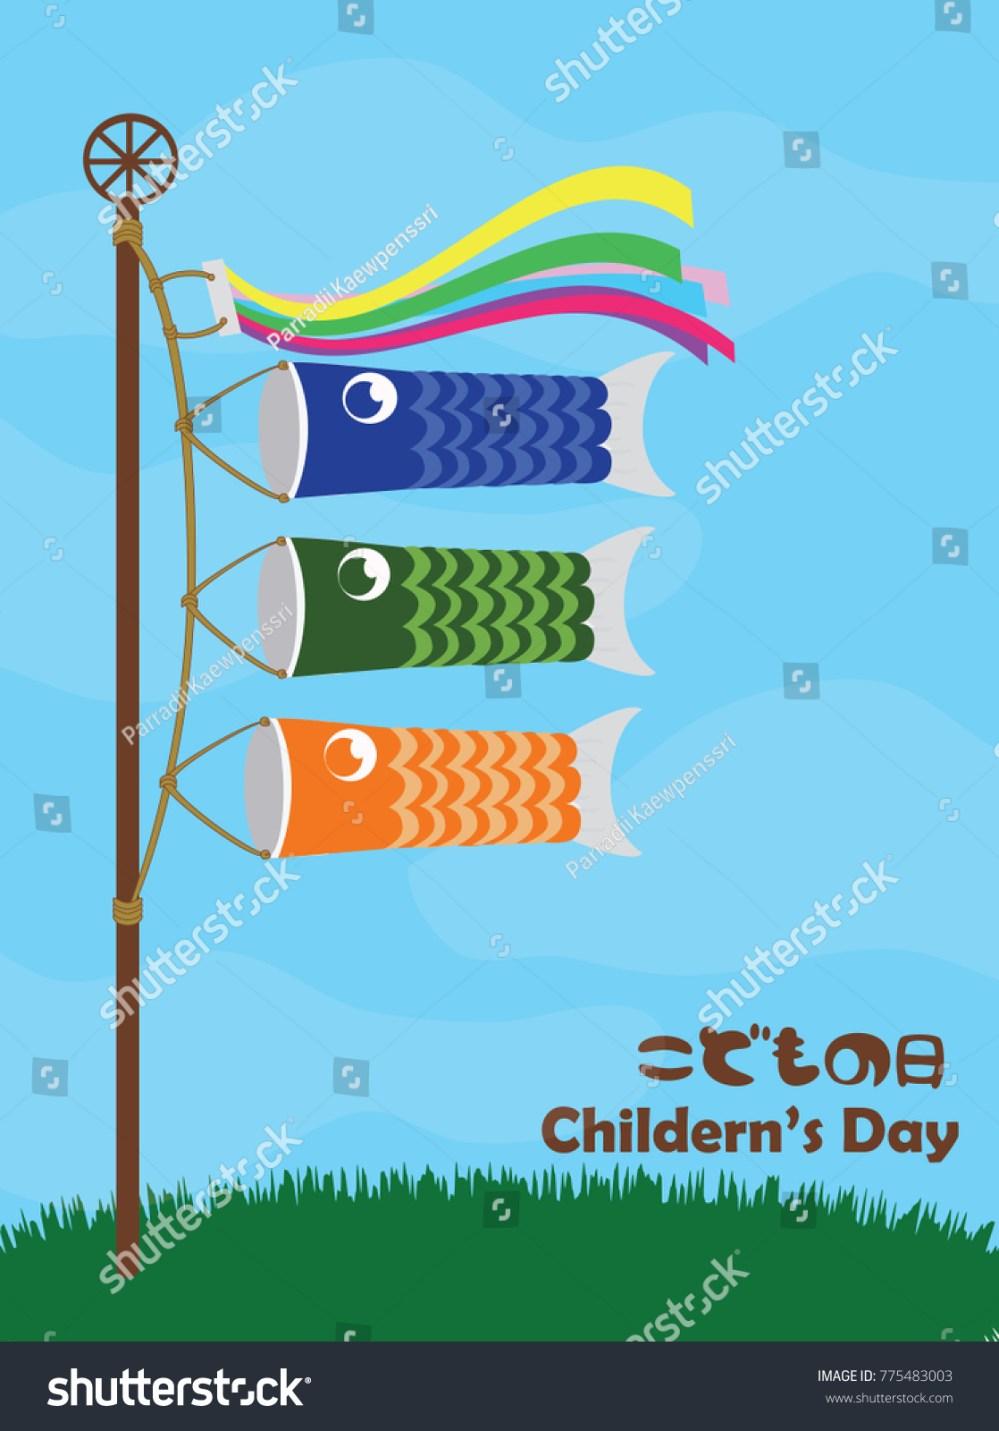 medium resolution of koinobori day koi fish flags are put up on children s day in japan